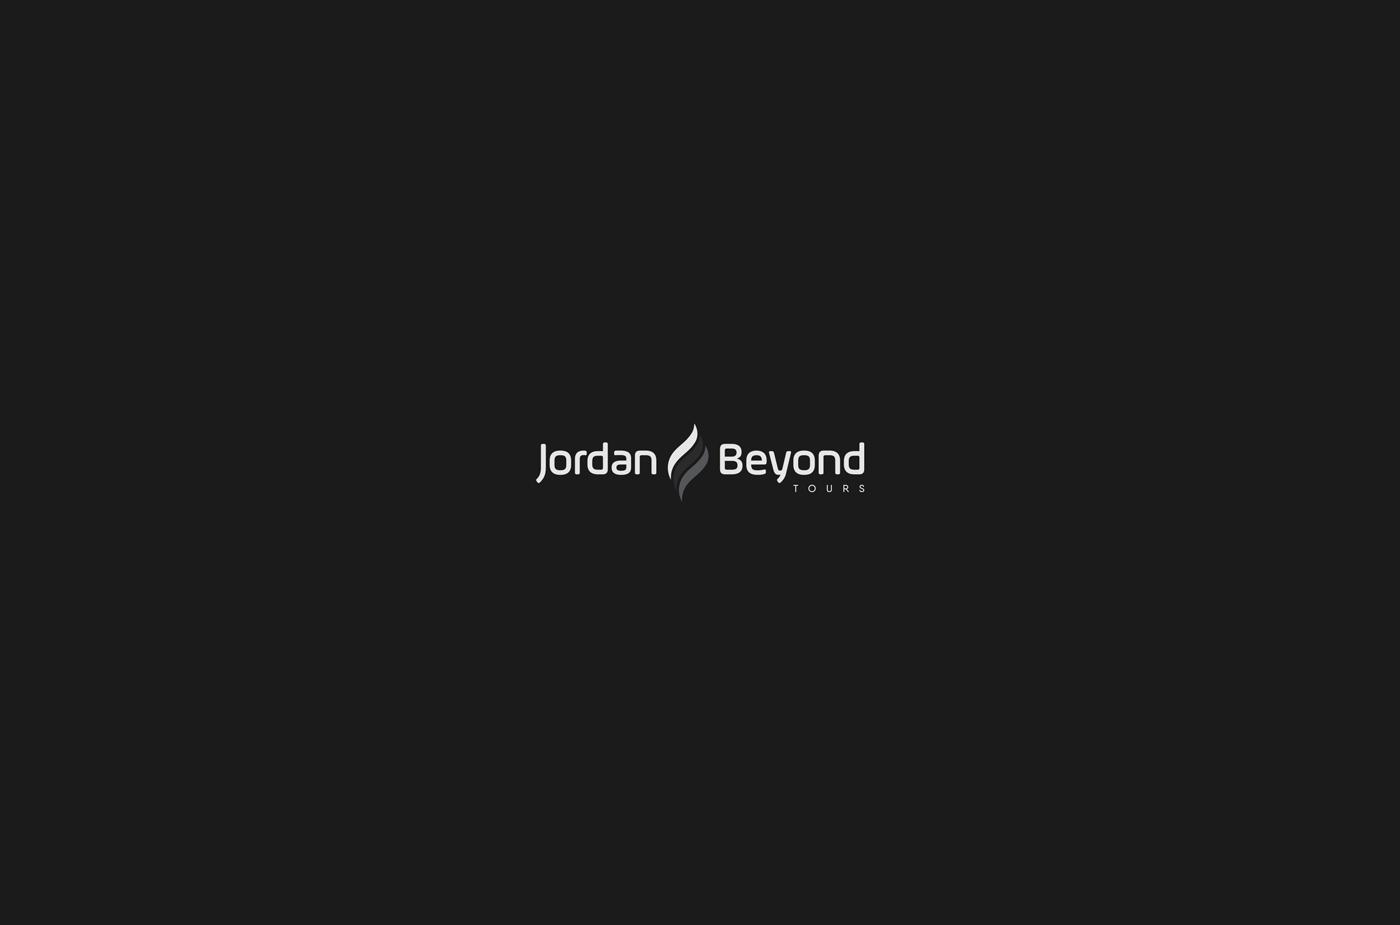 Jordan Beyond.png